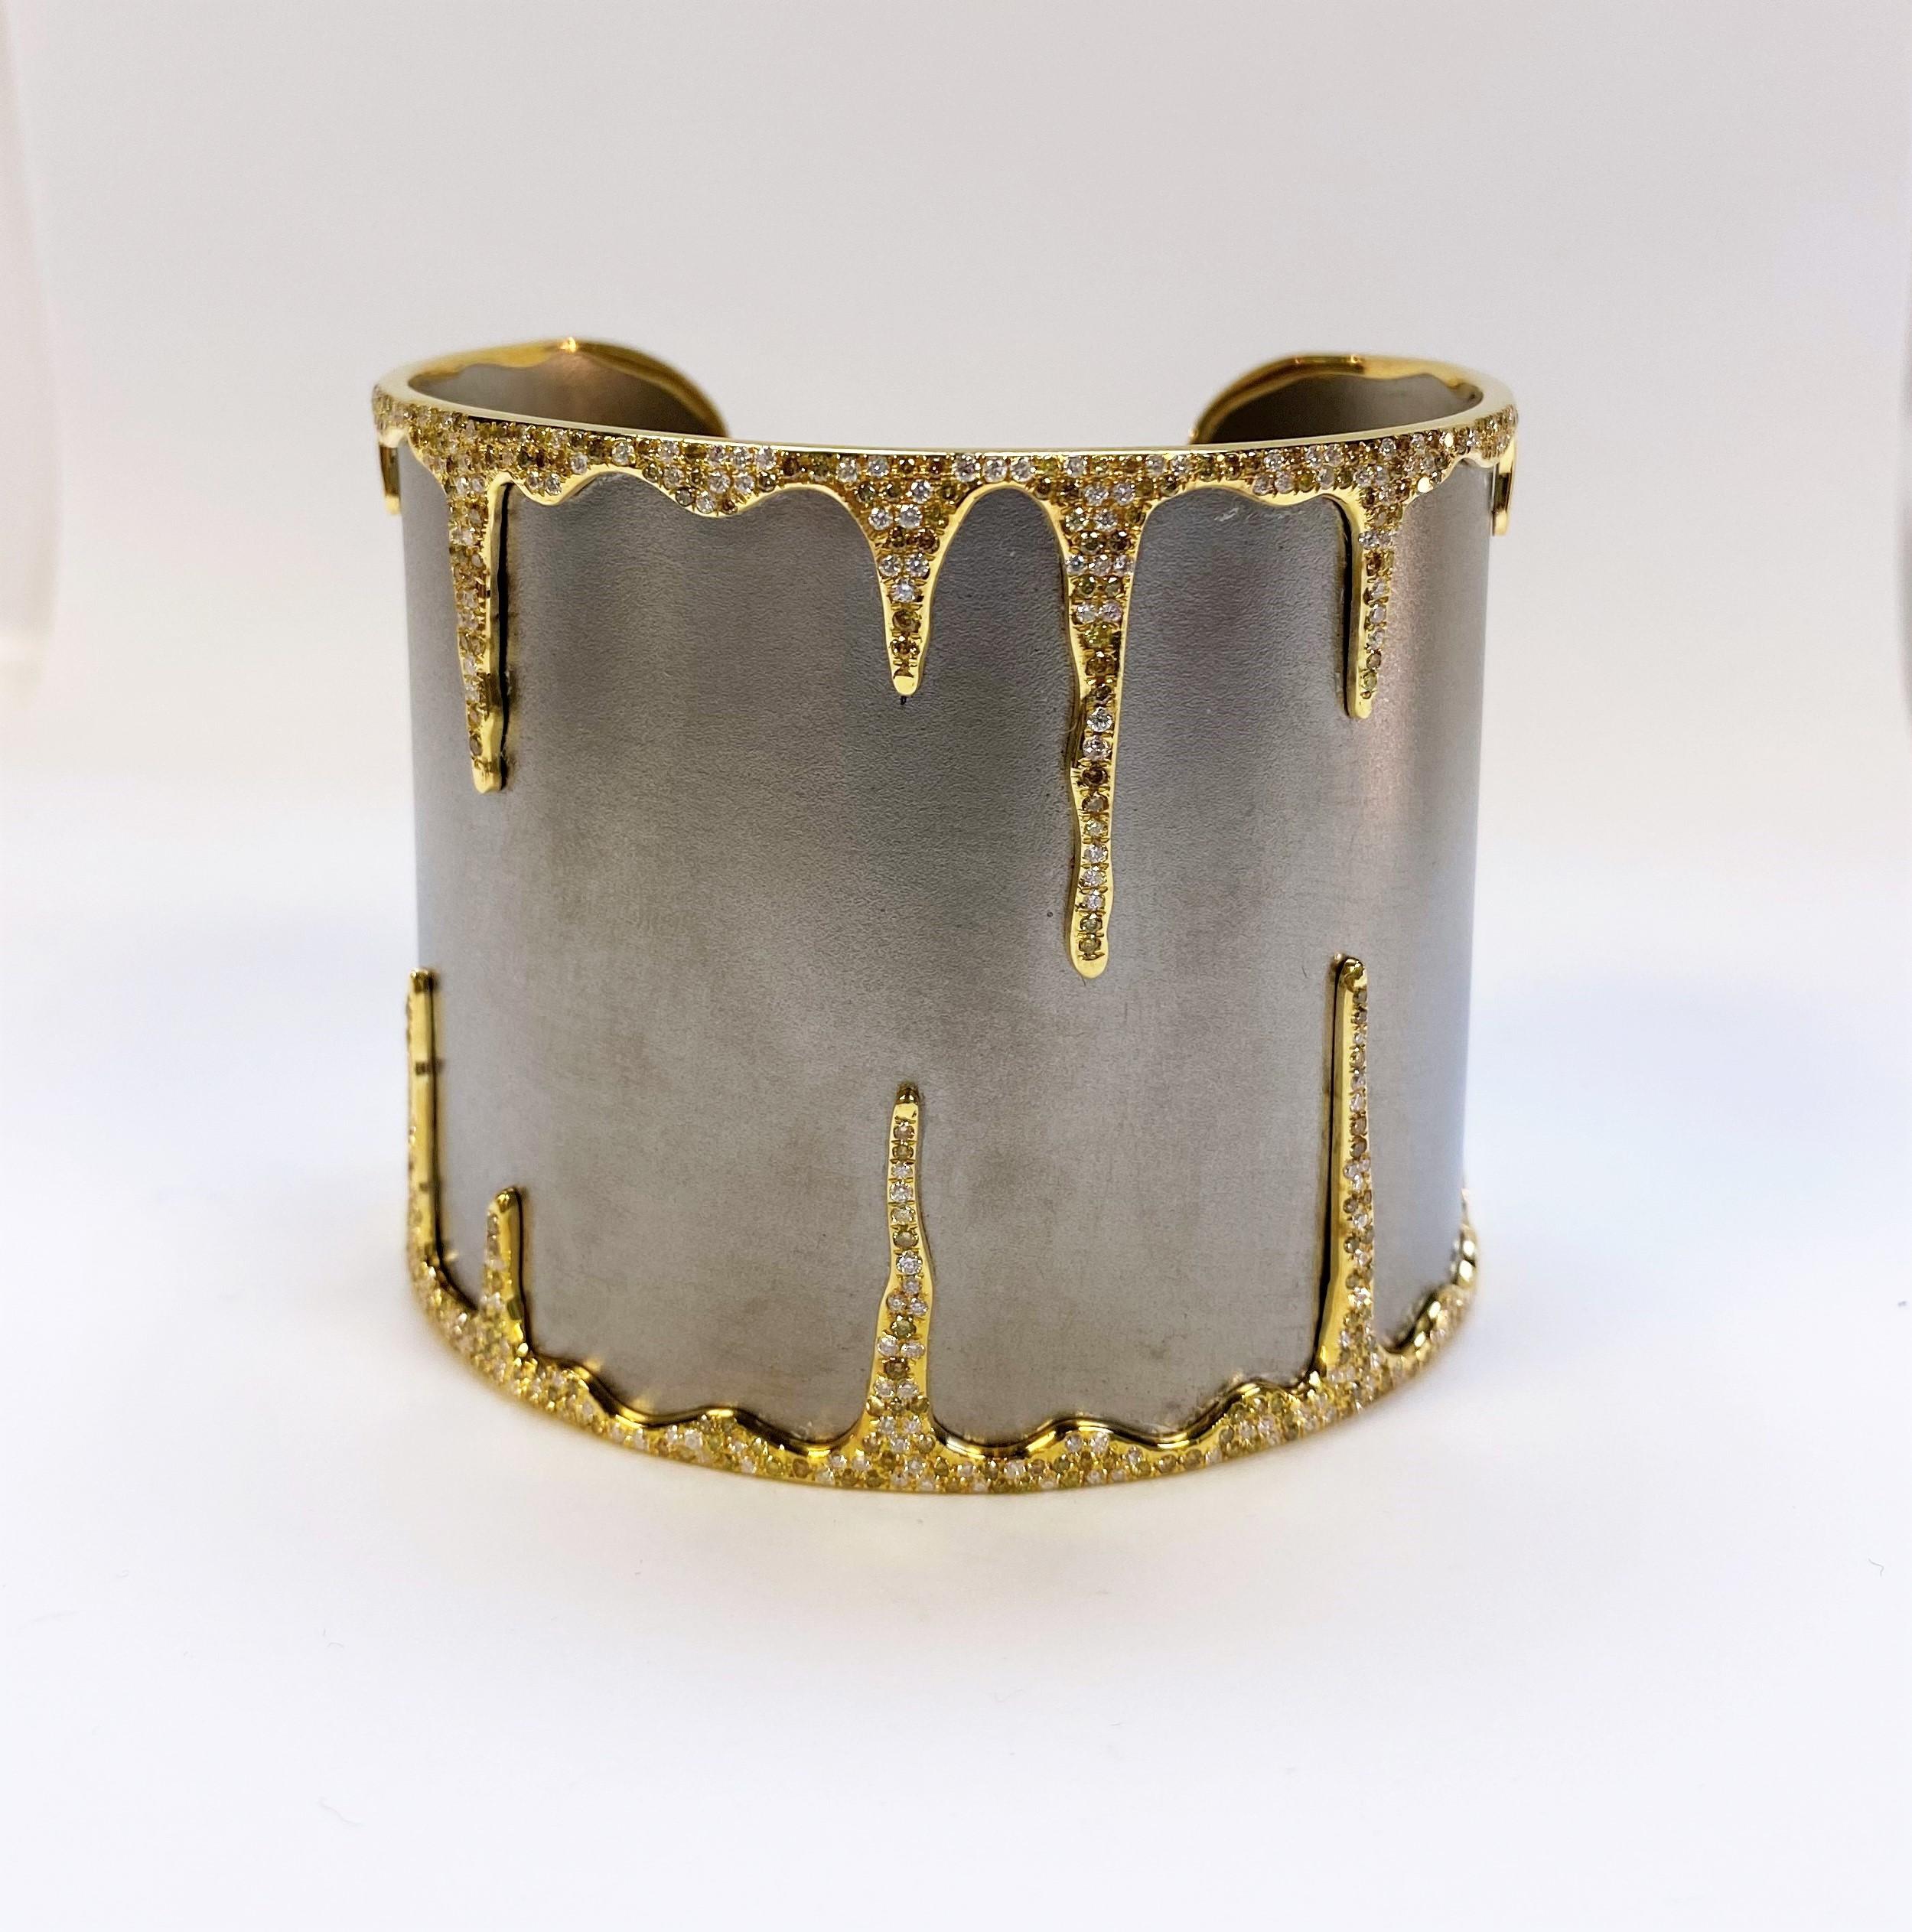 2.75 Carats Diamond Cuff